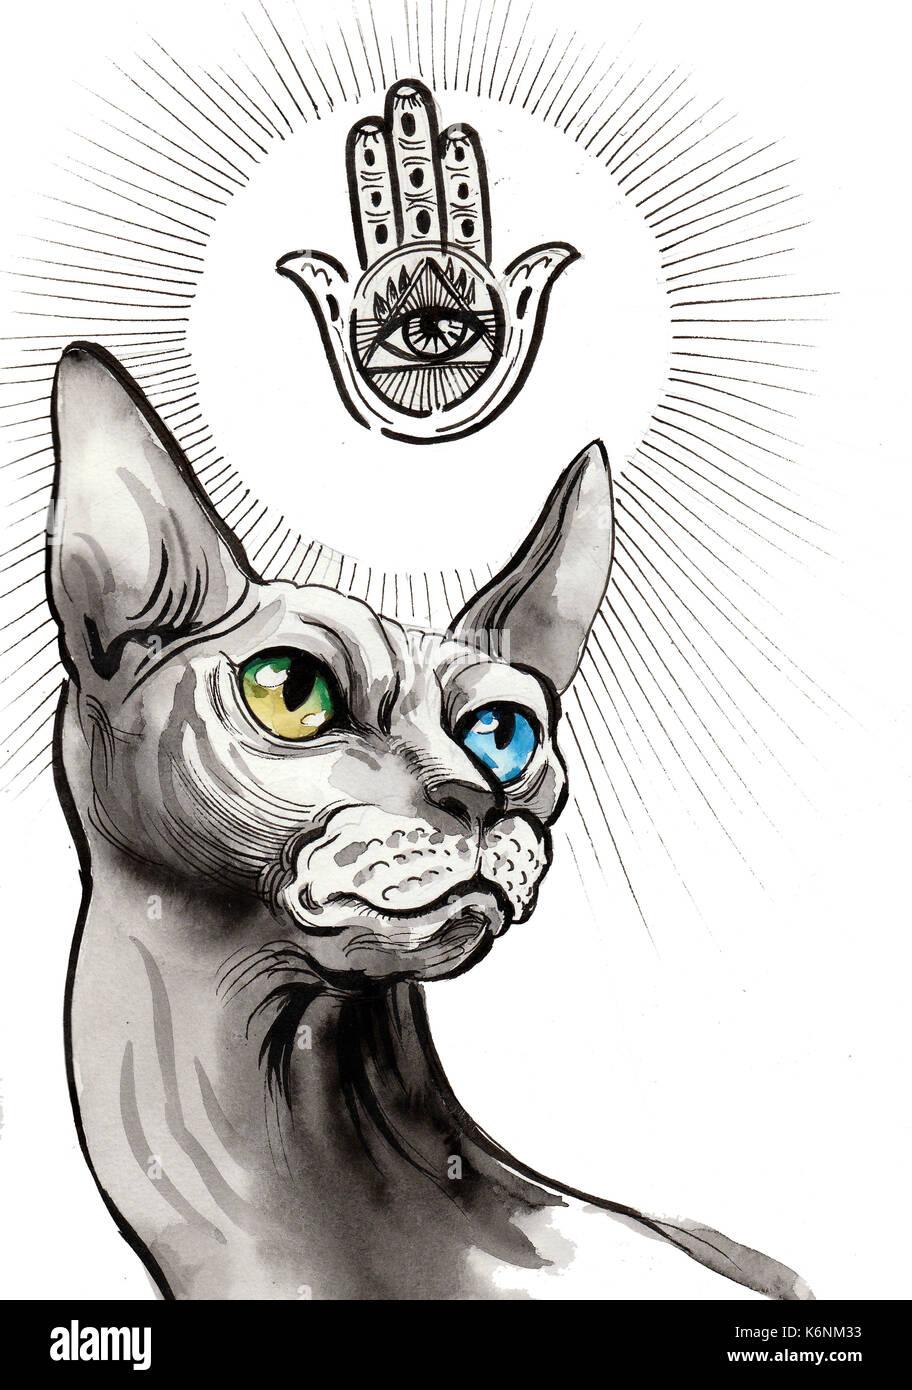 Sphinx Cat Stock Photos & Sphinx Cat Stock Images - Alamy